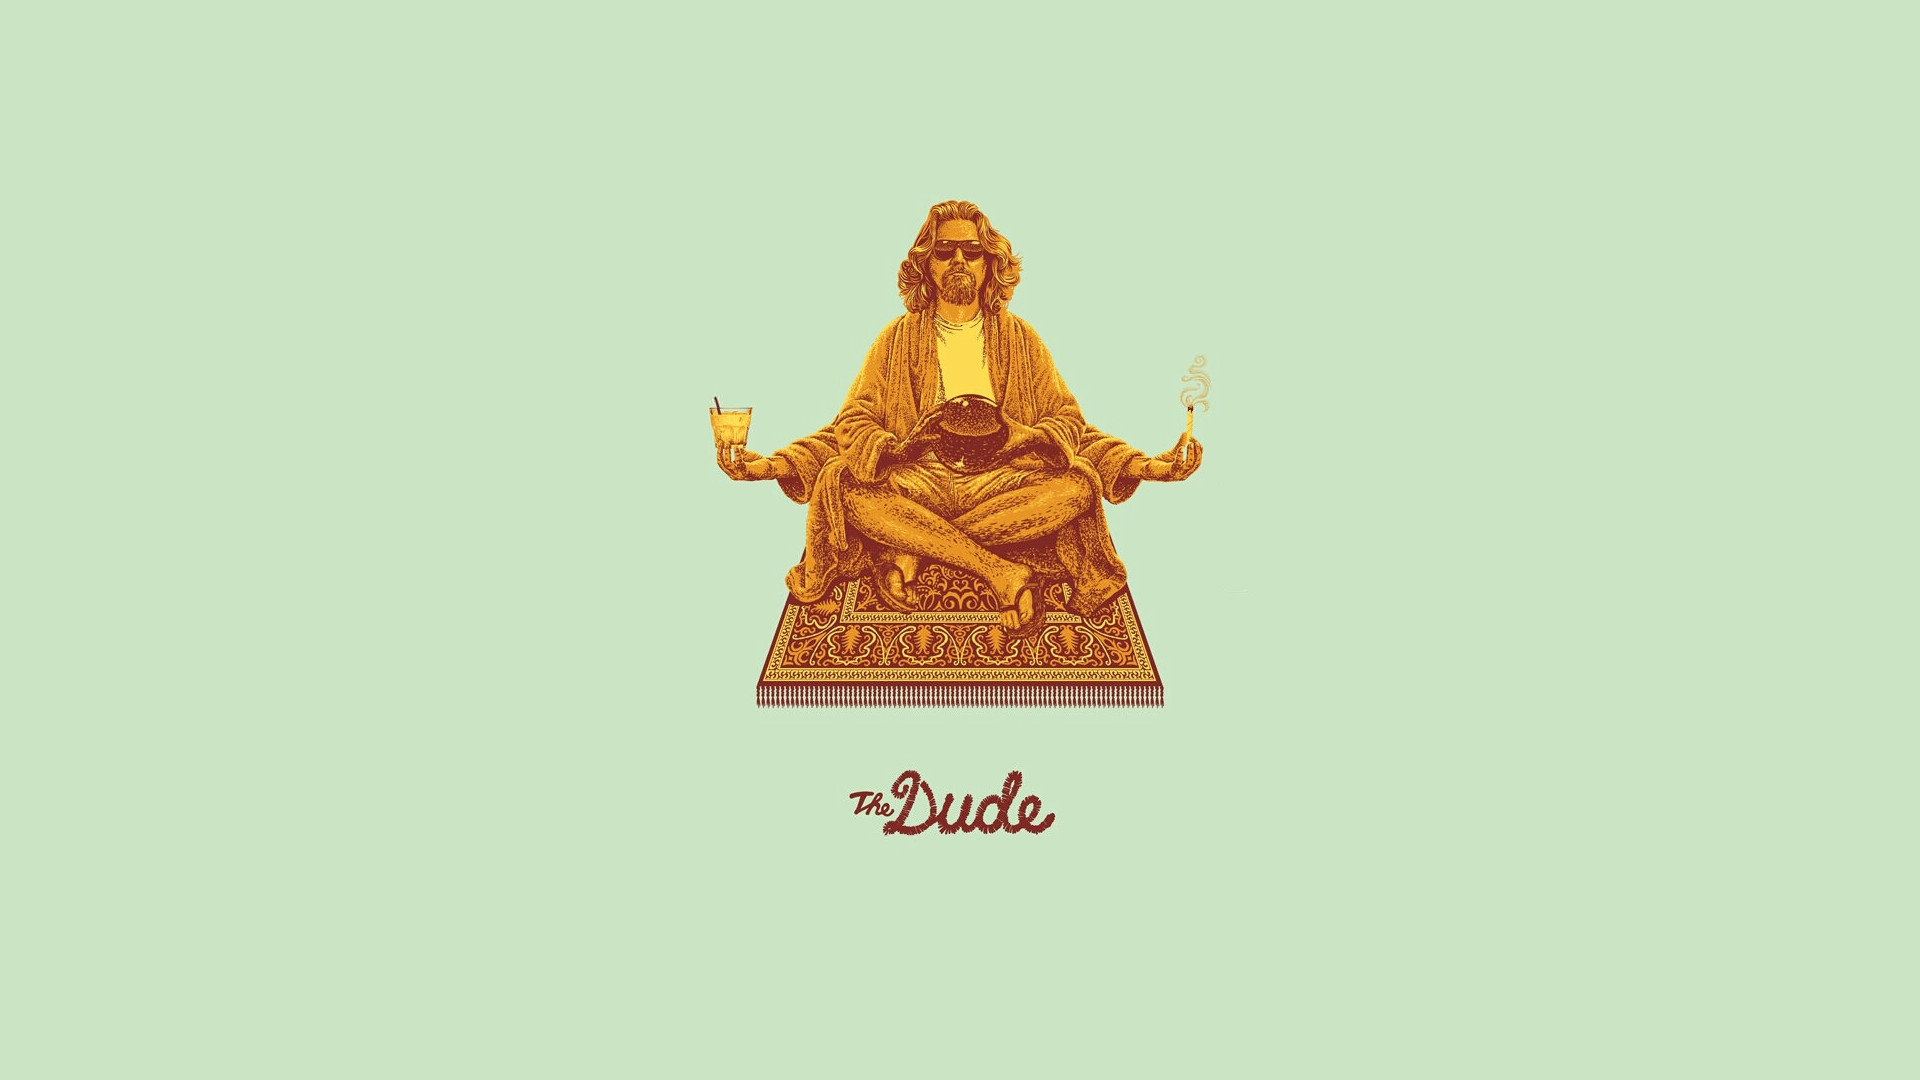 The Dude wallpaper, Big Lebowski The Dude meditating on carpet lotus .